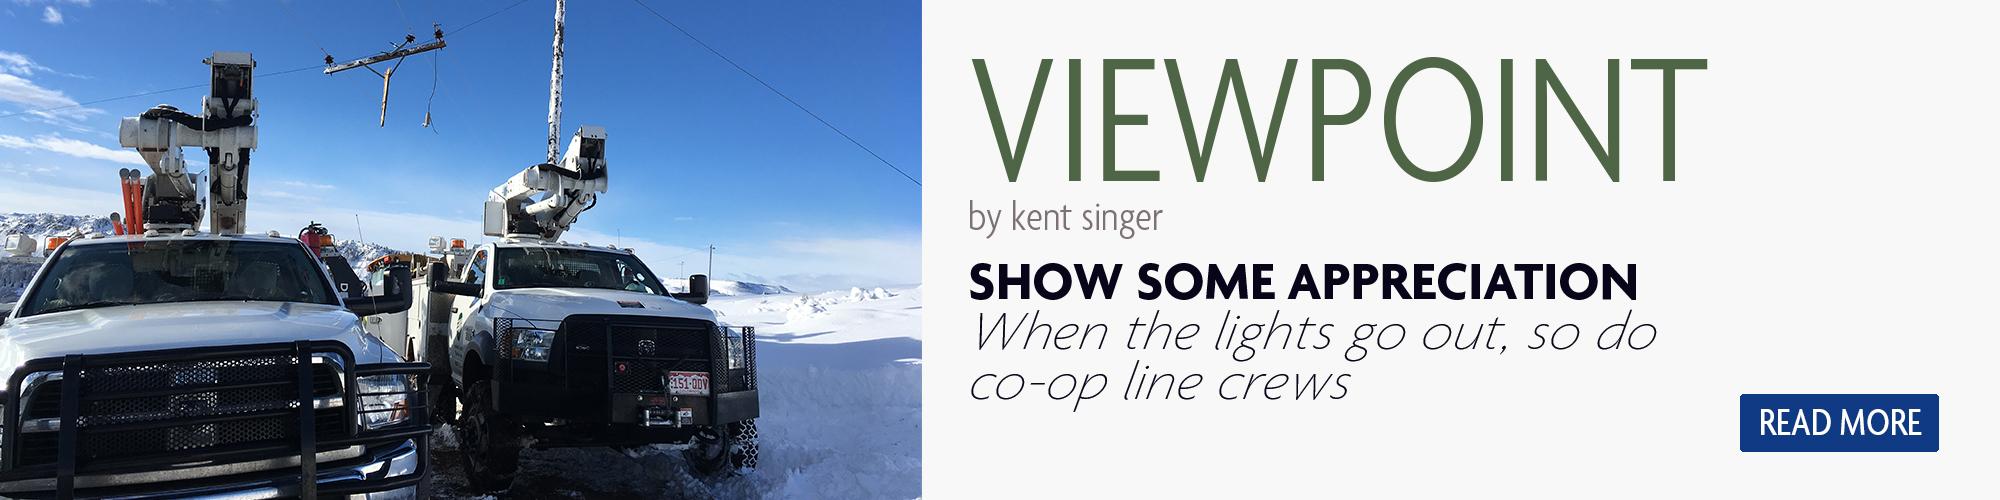 Viewpoint Slider (4)